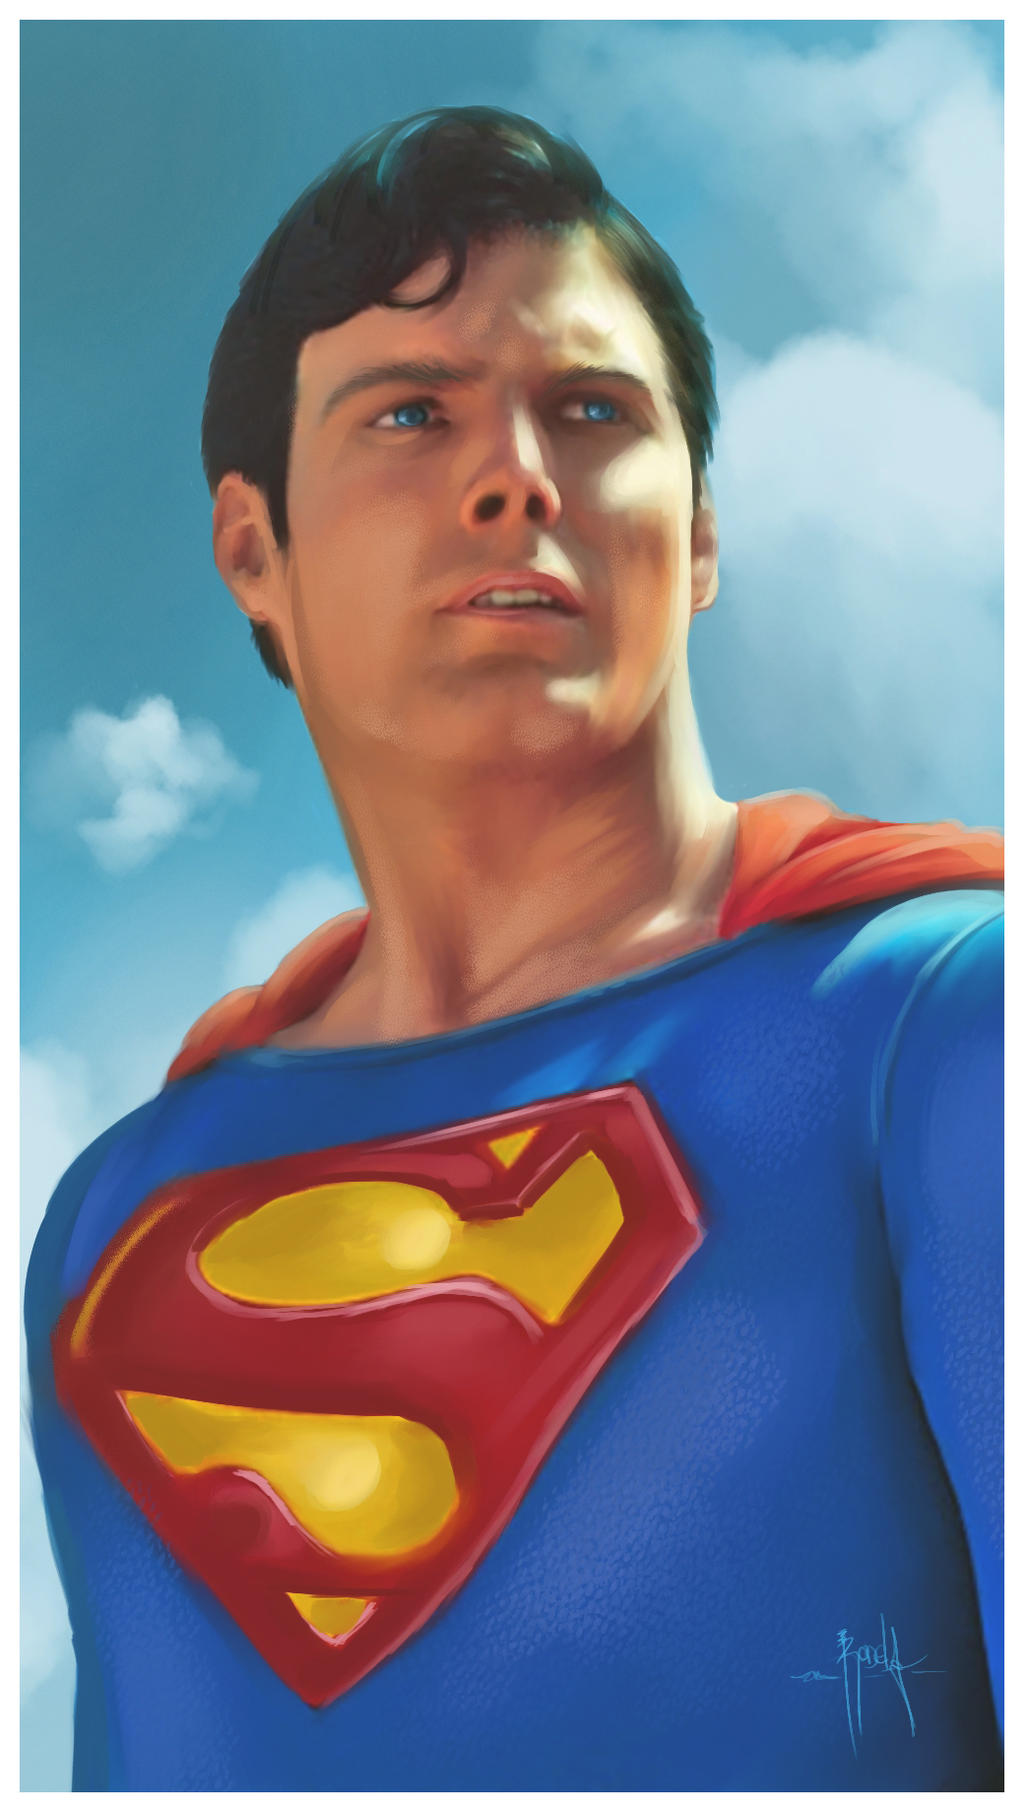 Superman by gerky-art